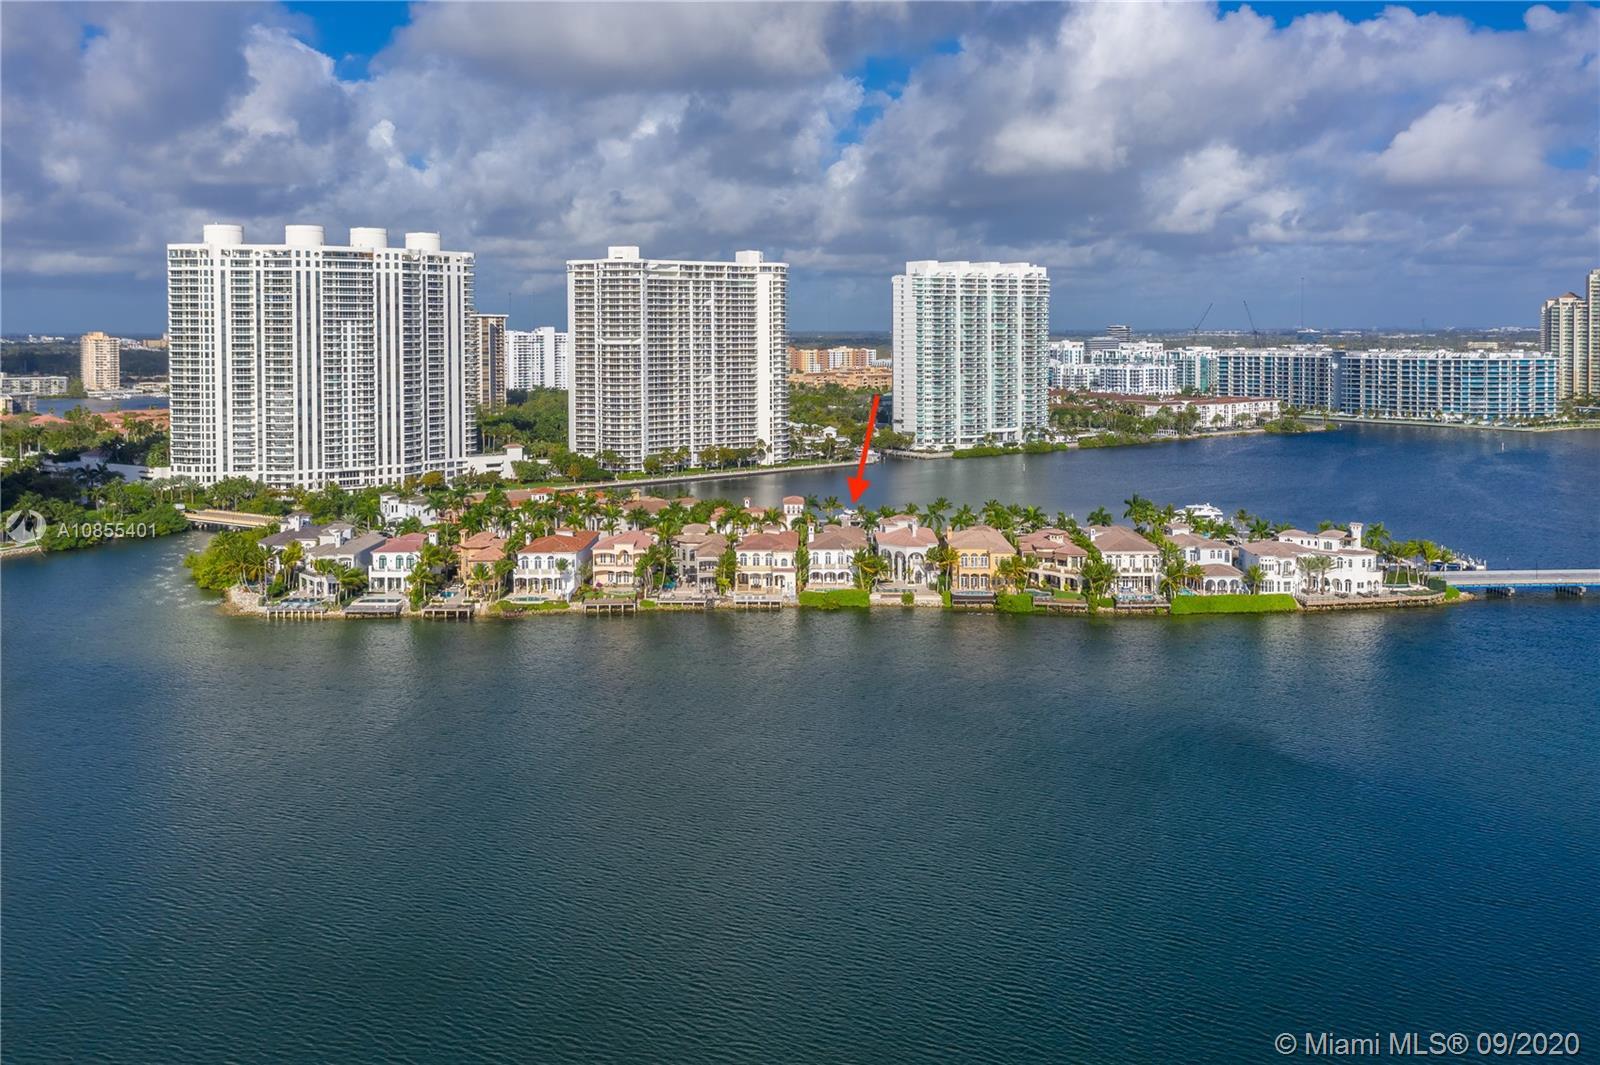 4032  Island Estates Dr  For Sale A10855401, FL